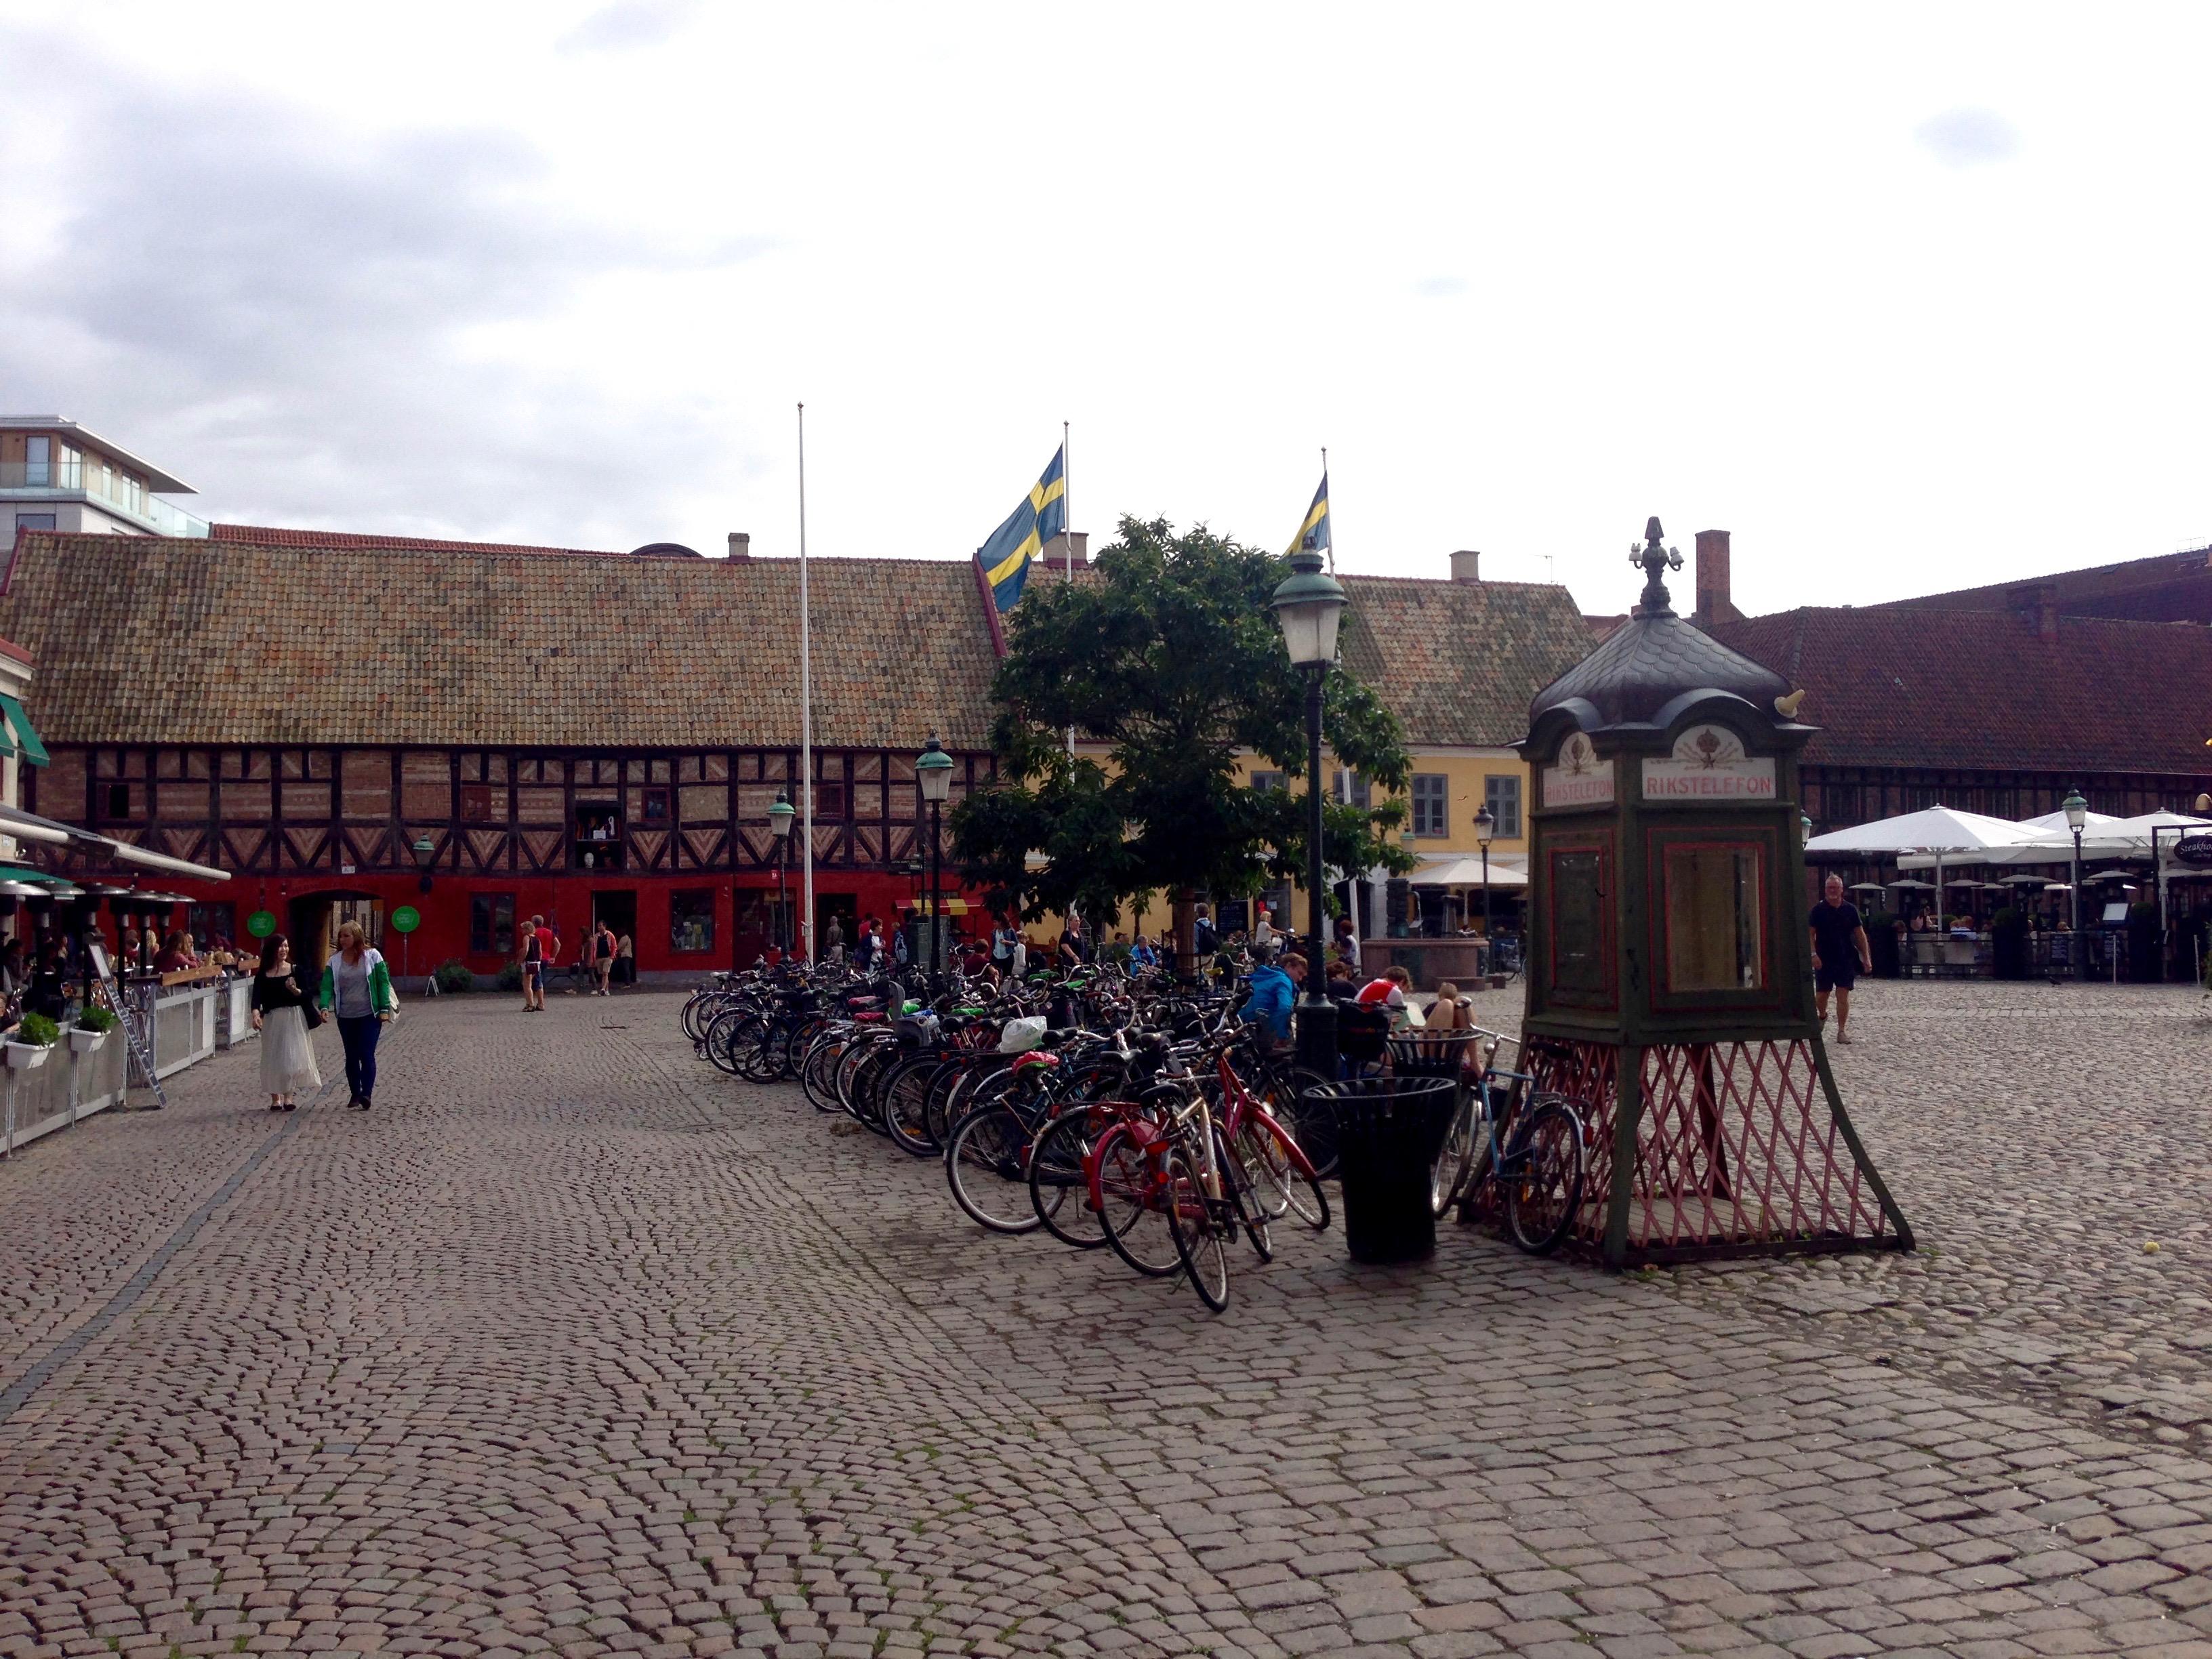 Restaurants next to Stortorget Square - Lilla torg 9